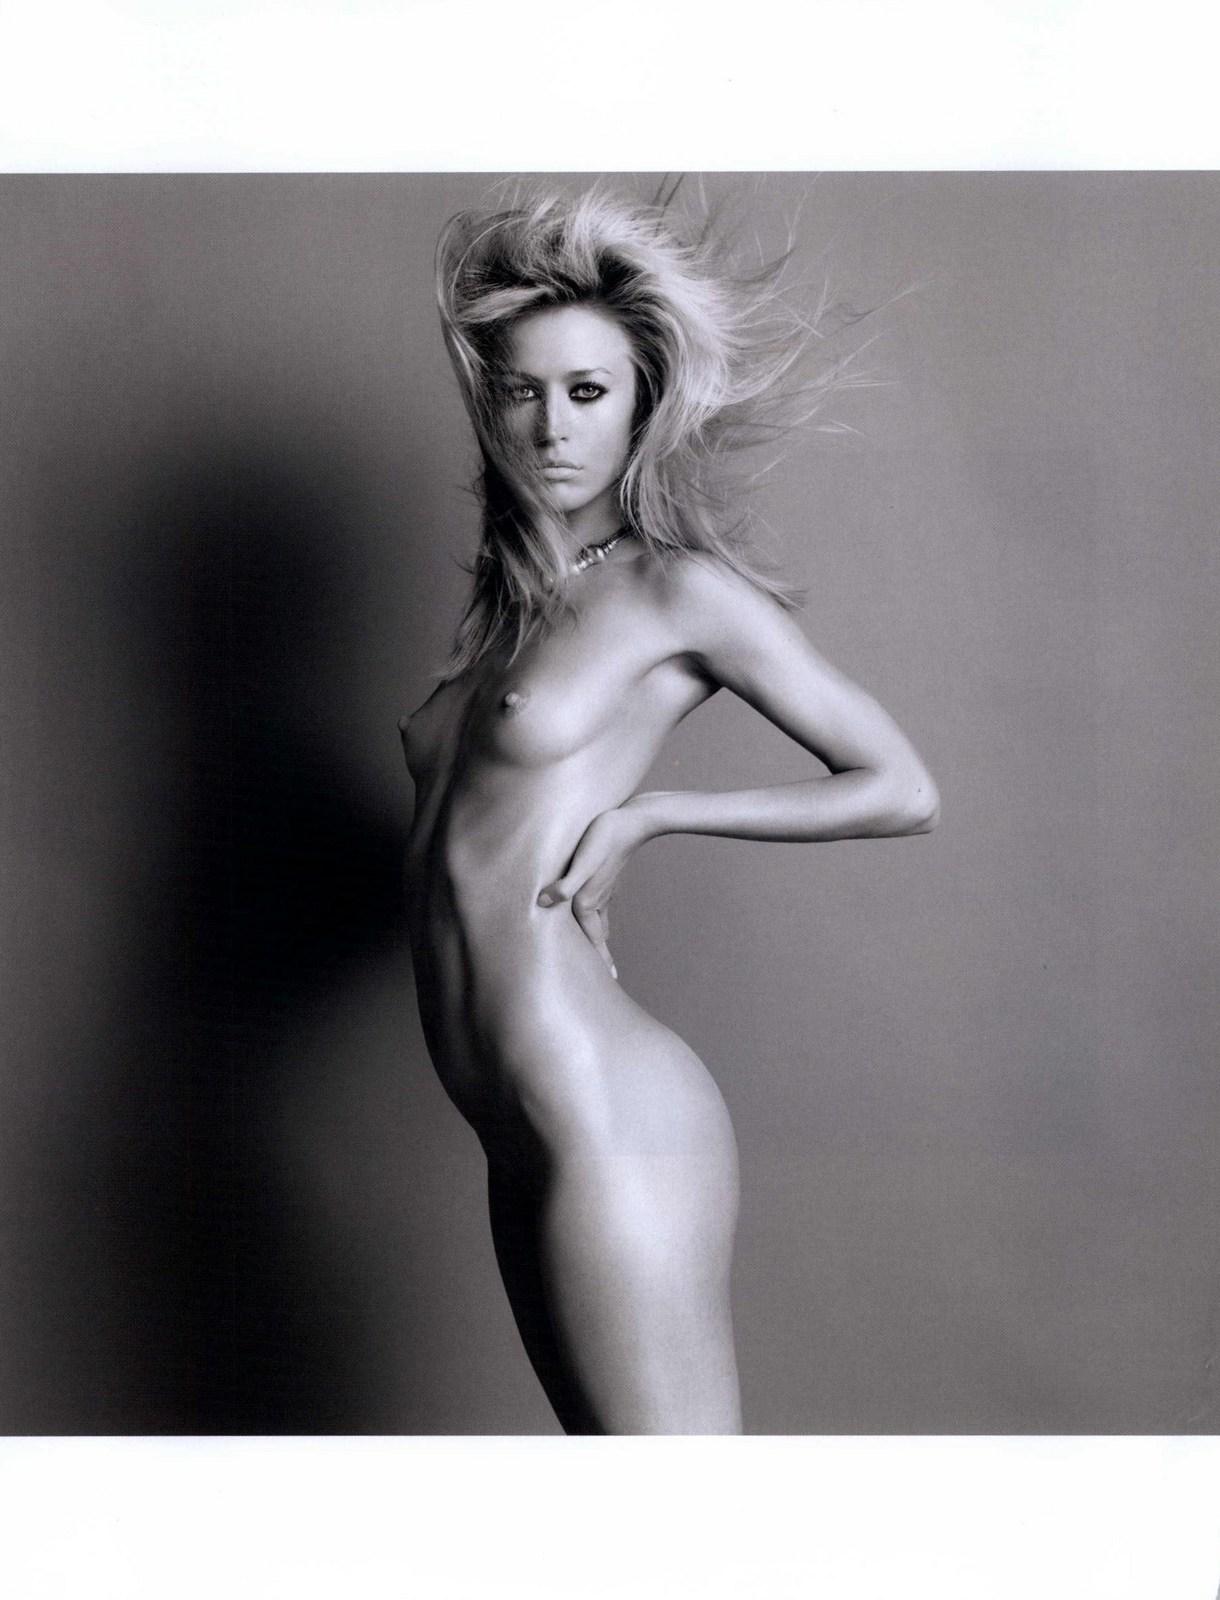 Watch Raquel zimmermann sexy photos video